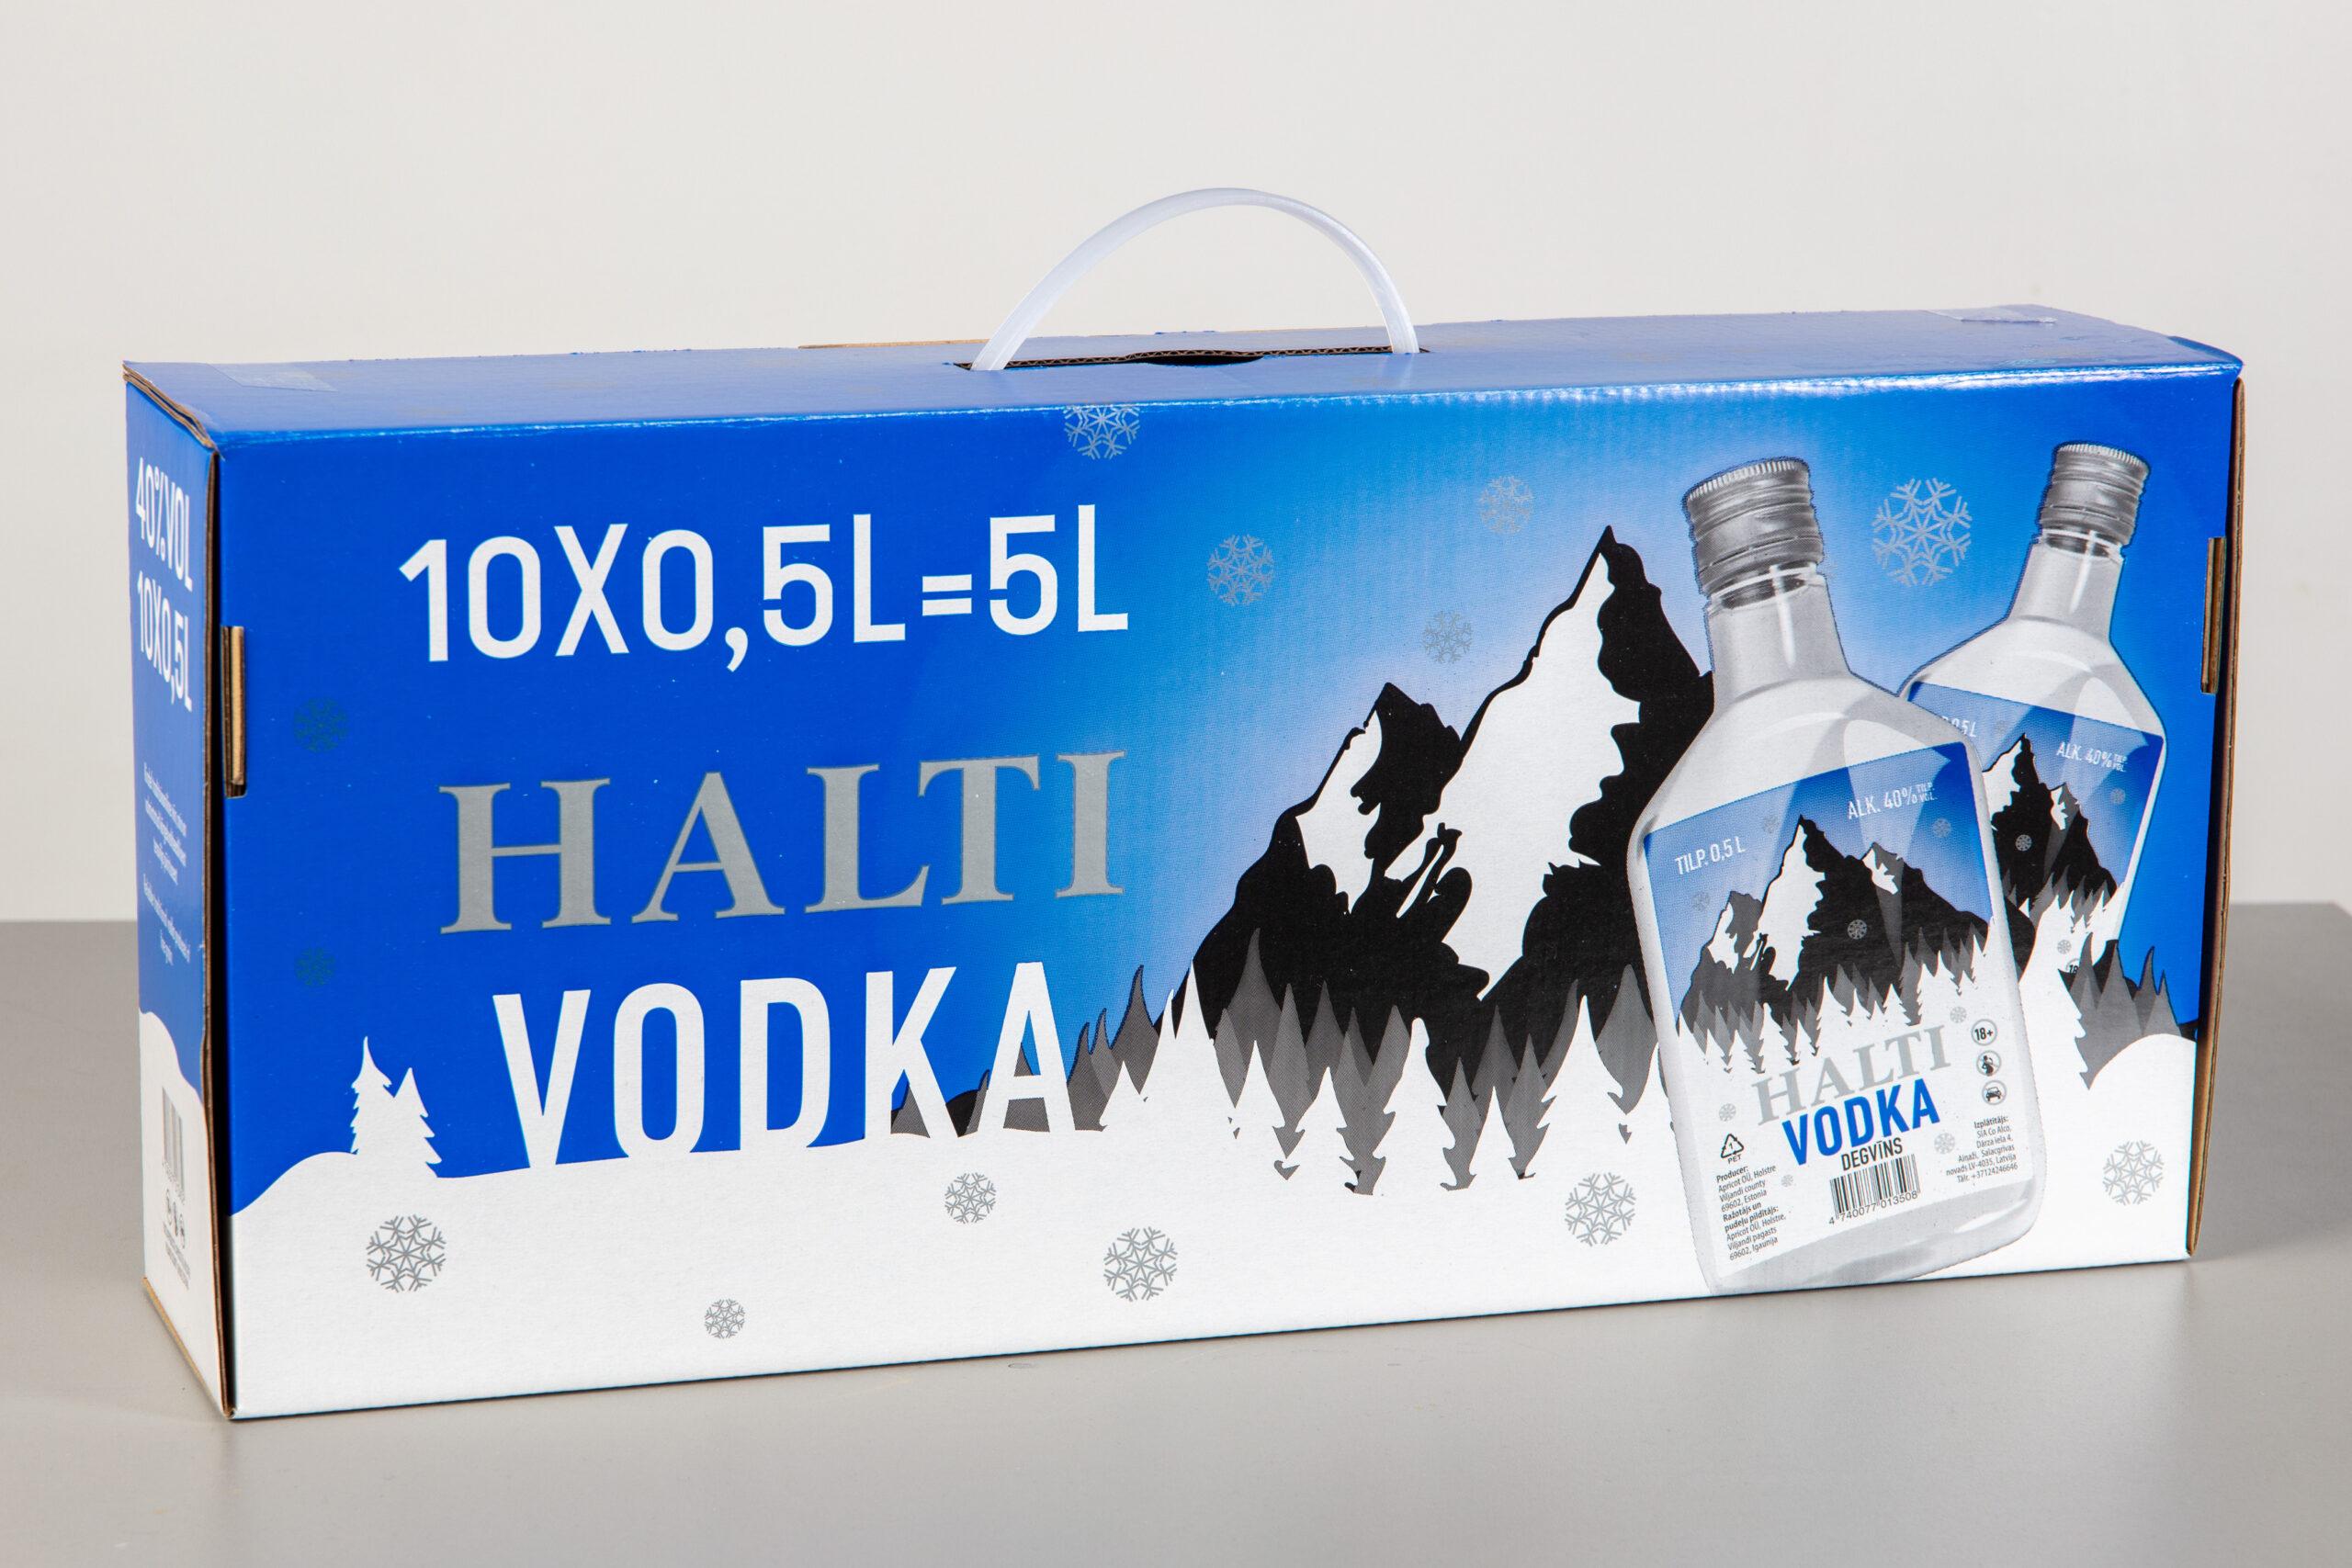 Halti Vodka - Apricot OÜ